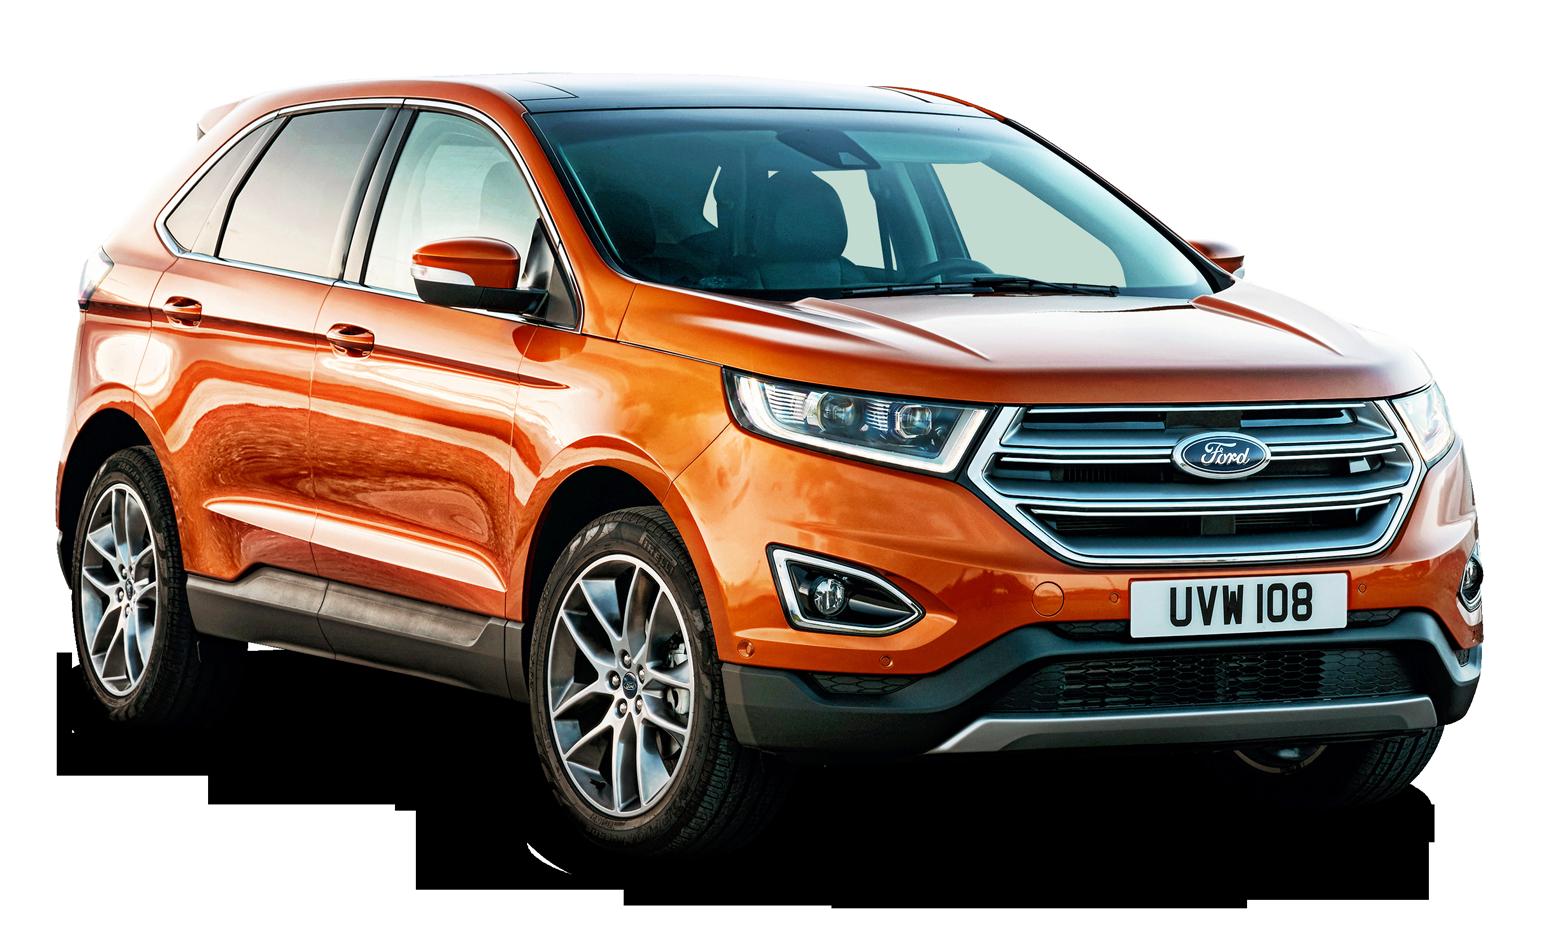 Ford Edge Orange Car Png Image Purepng Free Transparent Cc Png Image Library